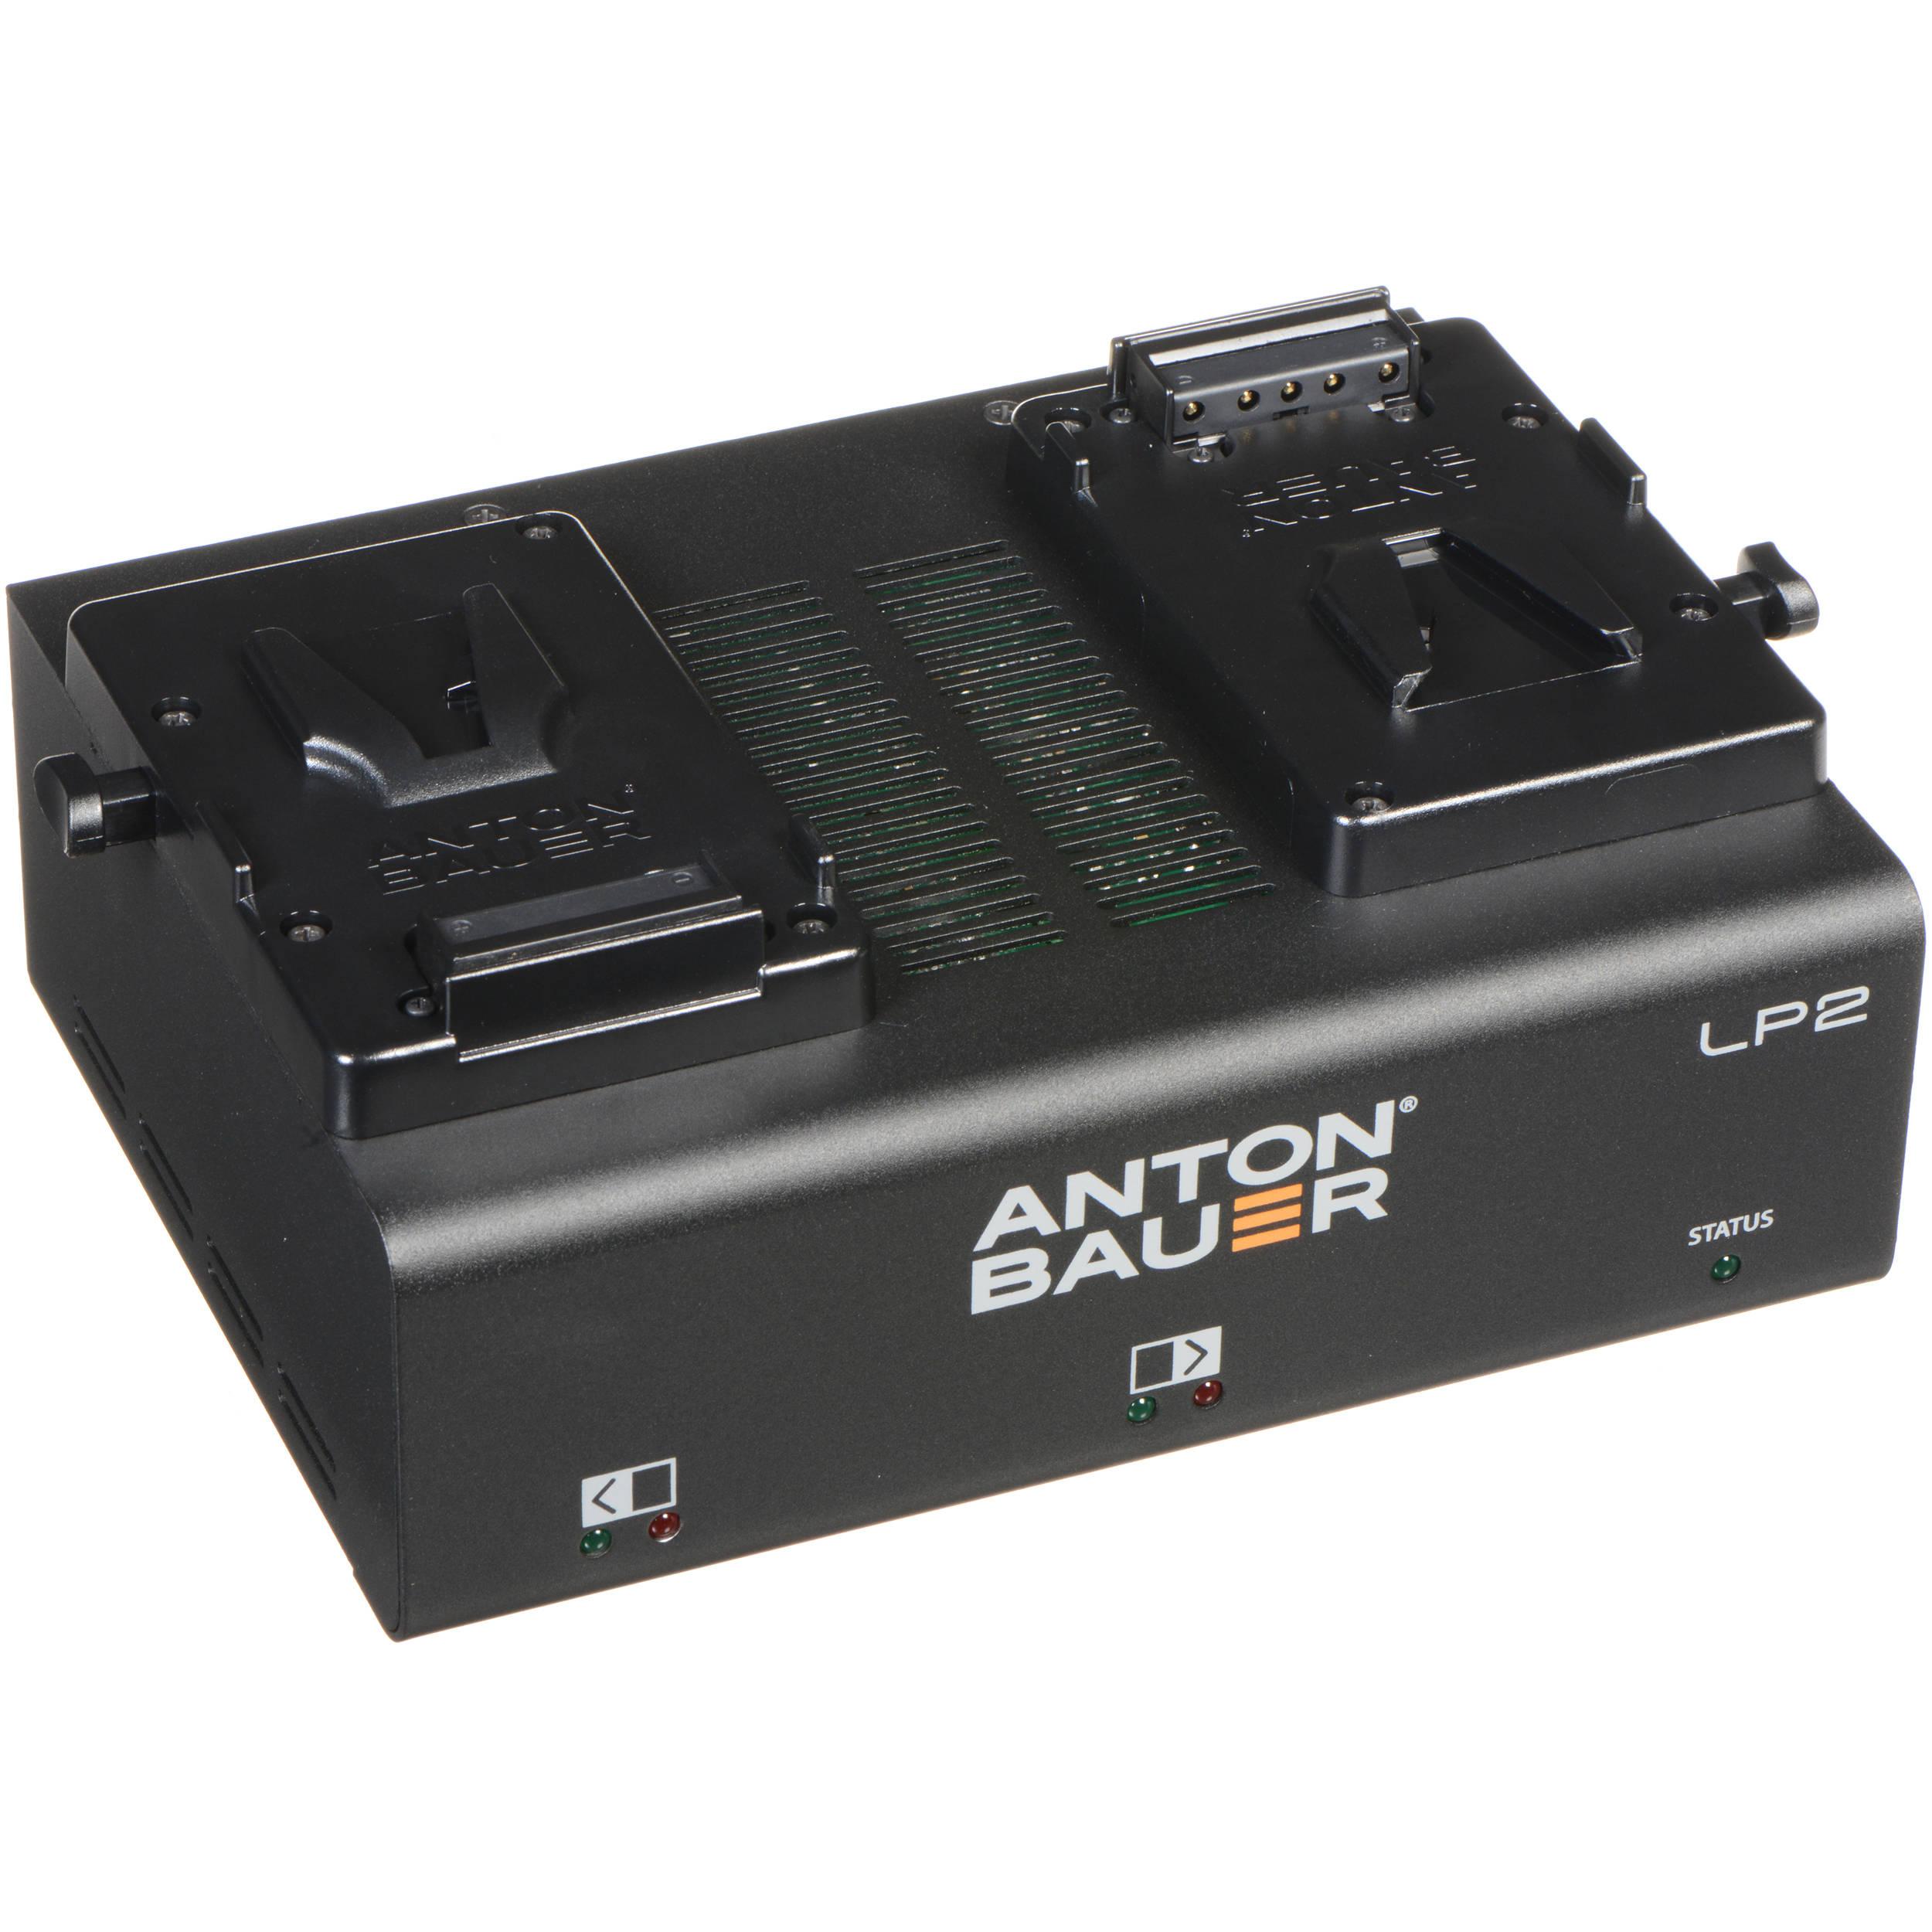 halvin katsella 100% laatu Anton Bauer LP2 Dual V-Mount Battery Charger